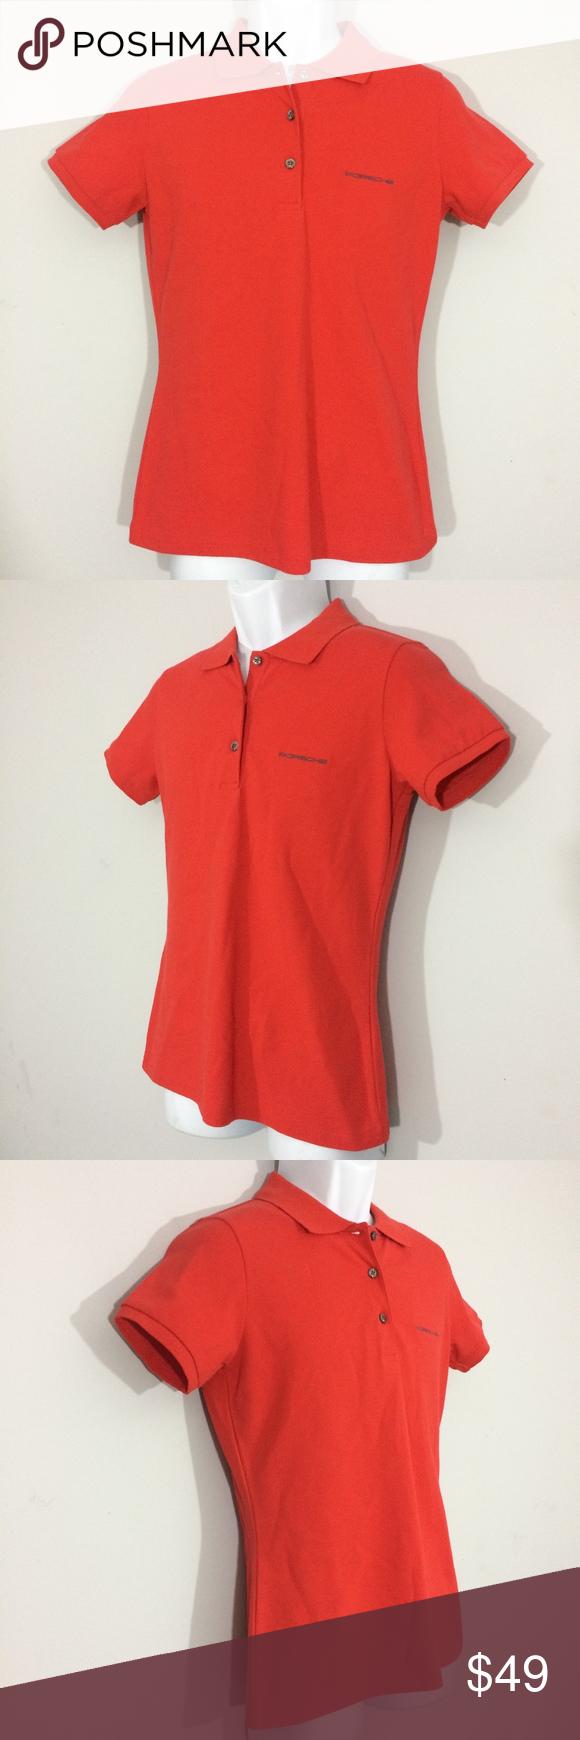 72c8b6d45 Porsche Design Driver's Selection Mens Small Polo Porsche Design Driver's  Selection Mens Small Red Polo Short Sleeve Golf Rugby Shirt Cotton Blend  Clean, ...